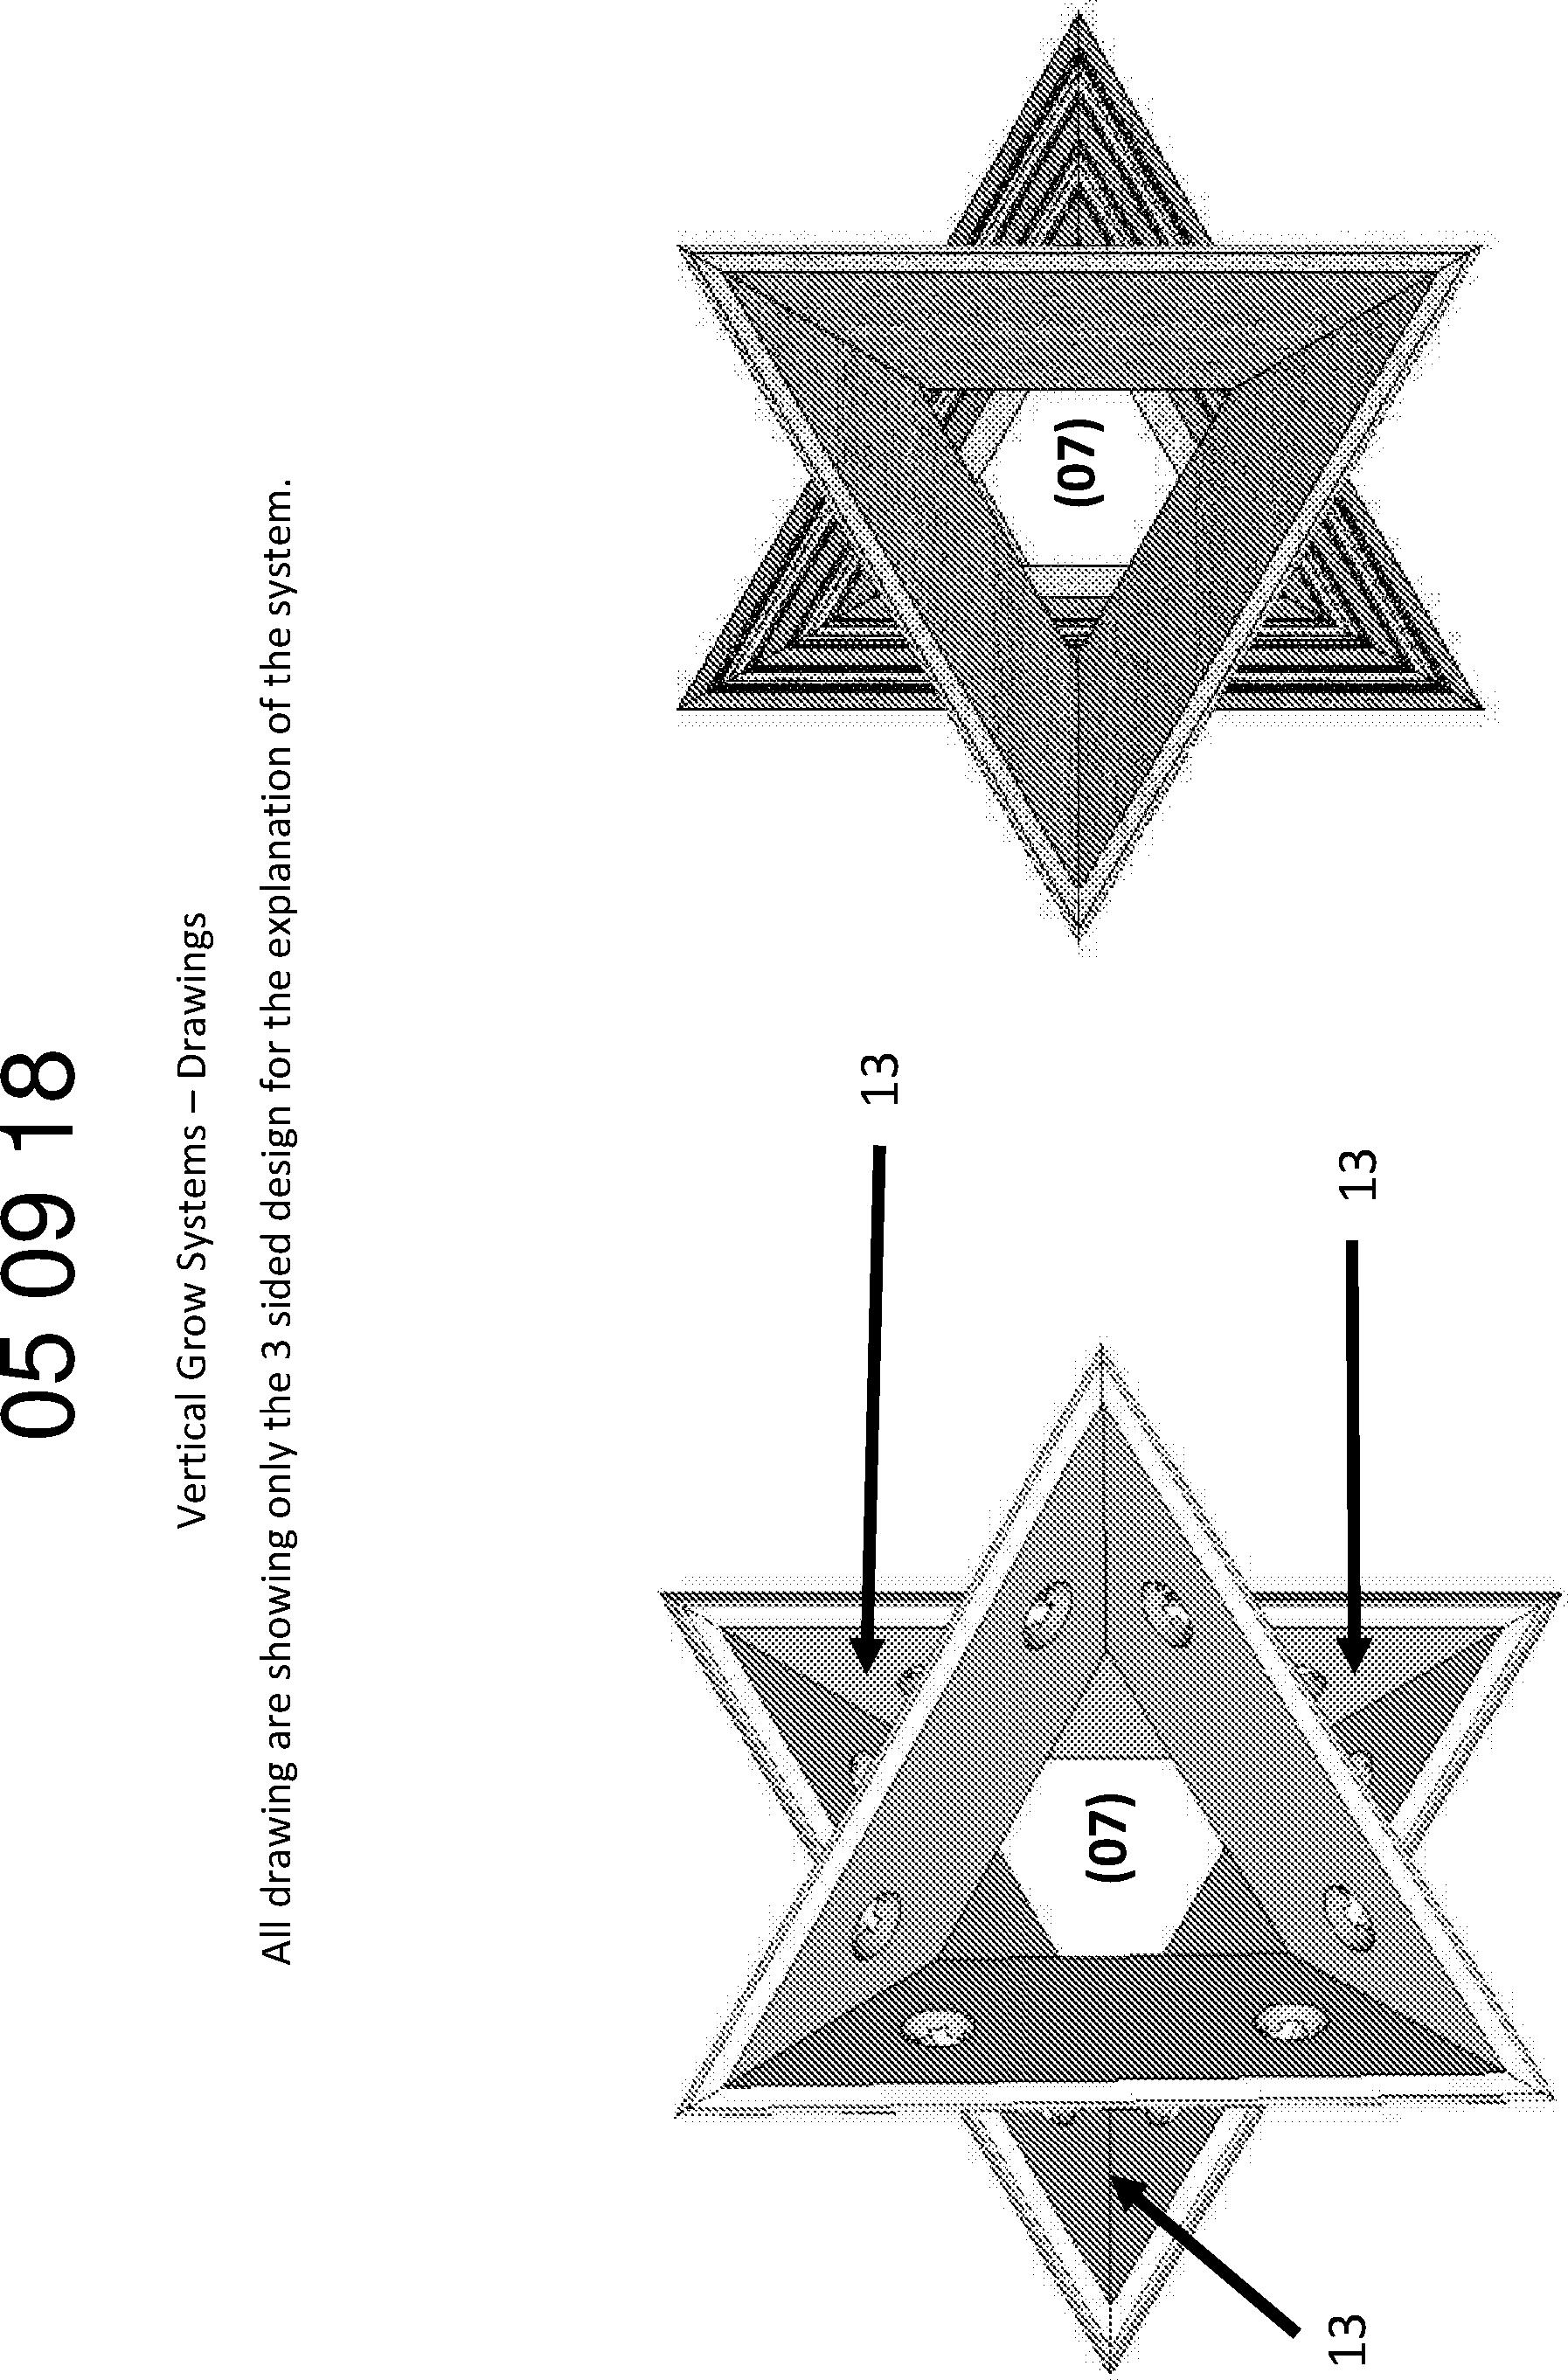 Figure GB2561803A_D0007